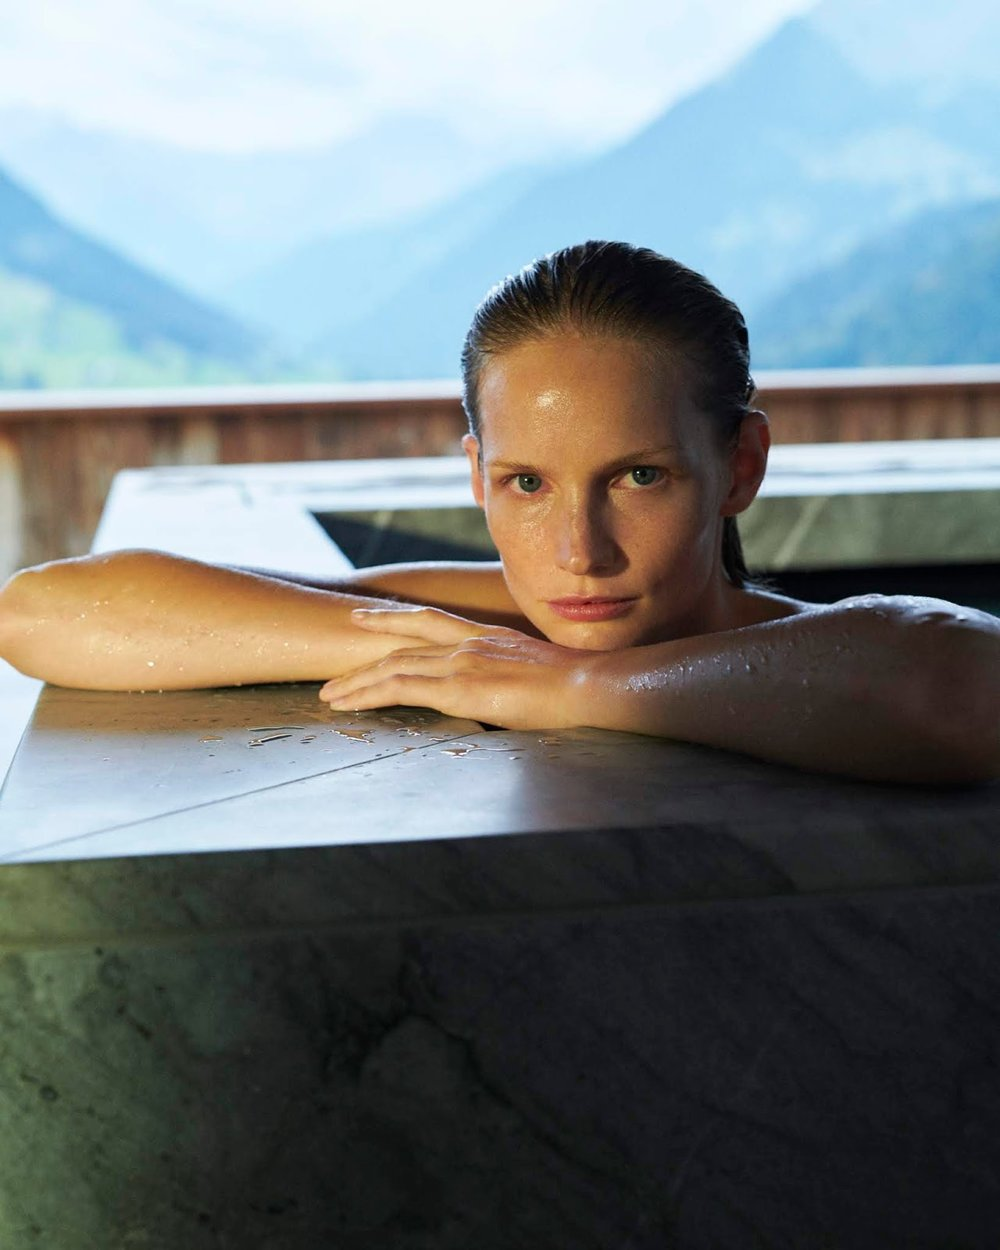 Katrin Thormann by Tobias Lundkvist for ELLE Germany (2).jpg